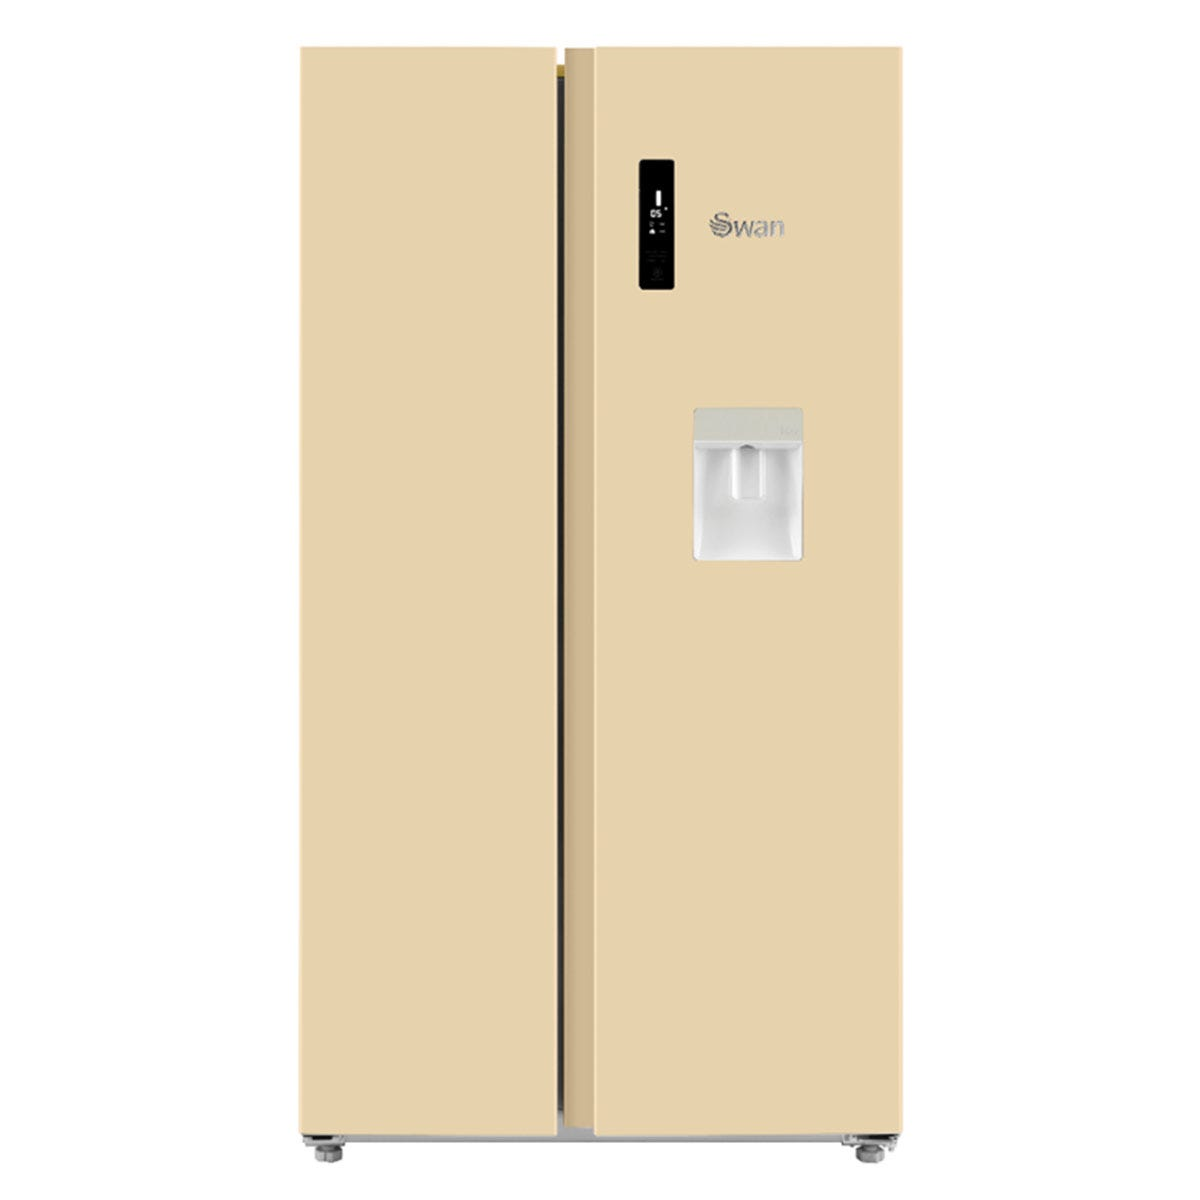 Swan SR15210CREN American-Style Fridge Freezer with Water Dispenser - Cream